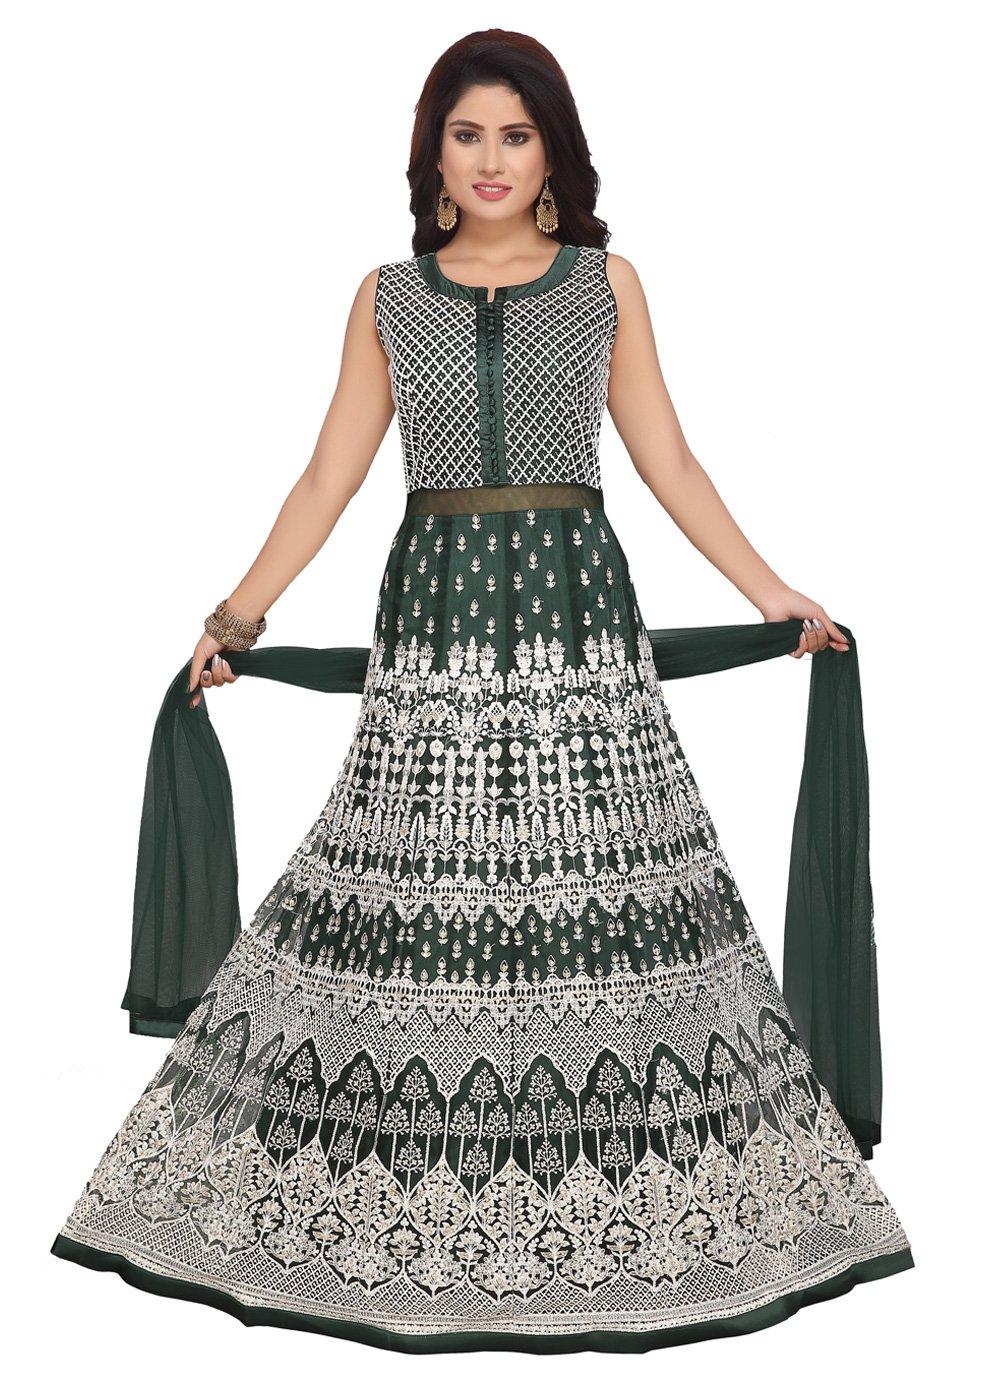 Net Embroidered Trendy Anarkali Salwar Suit in Green